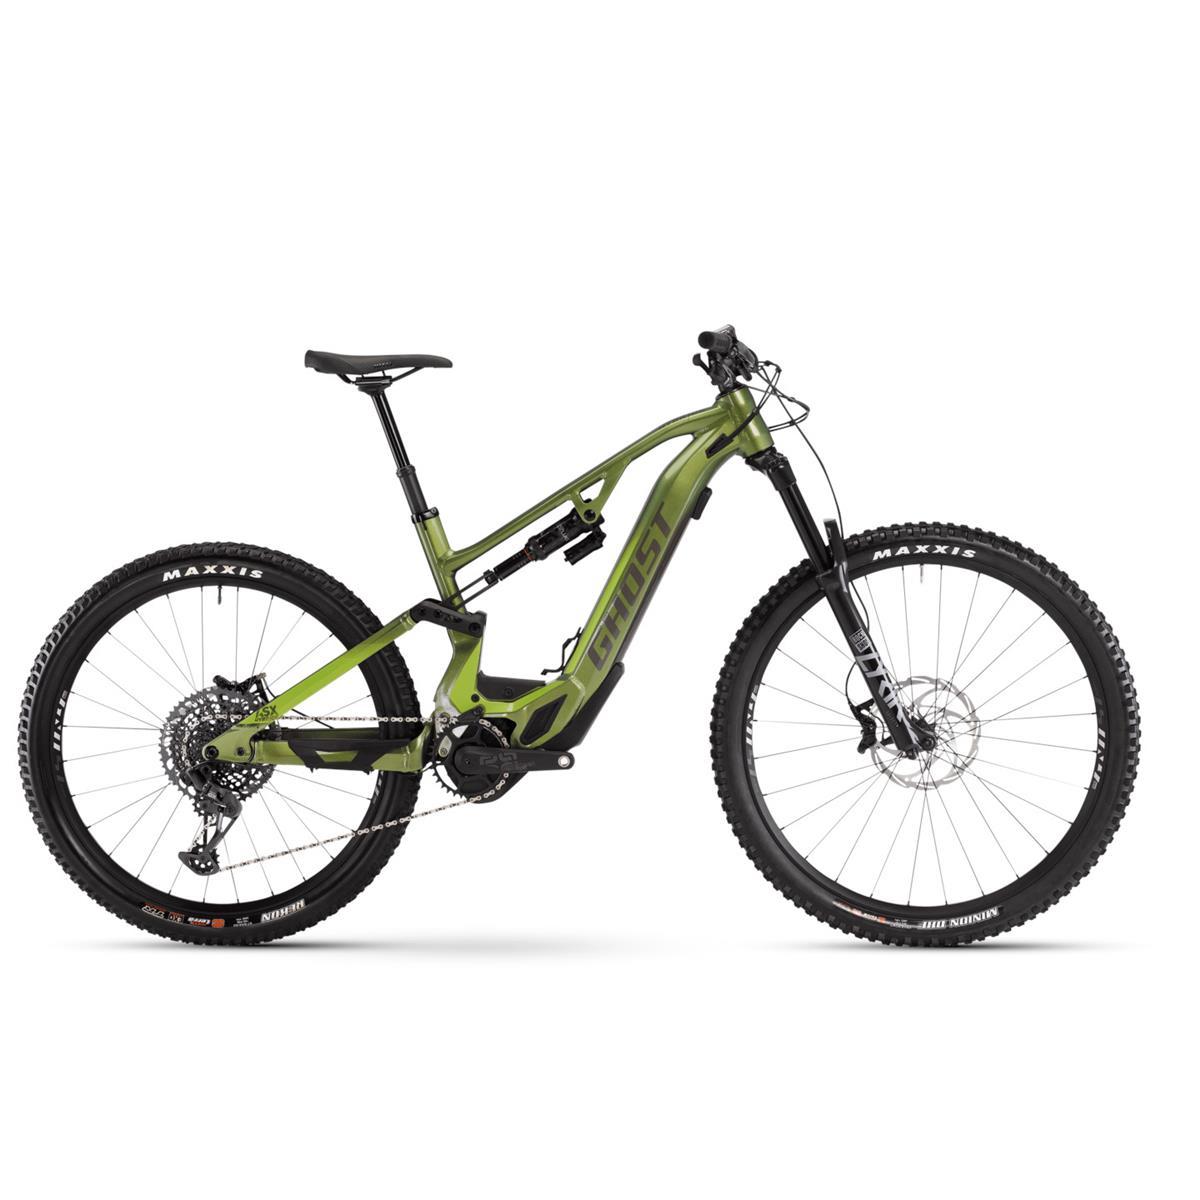 Hybride ASX Universal 29''/27.5'' 160mm 12s Bosch CX 625Wh Green 2021 Size S